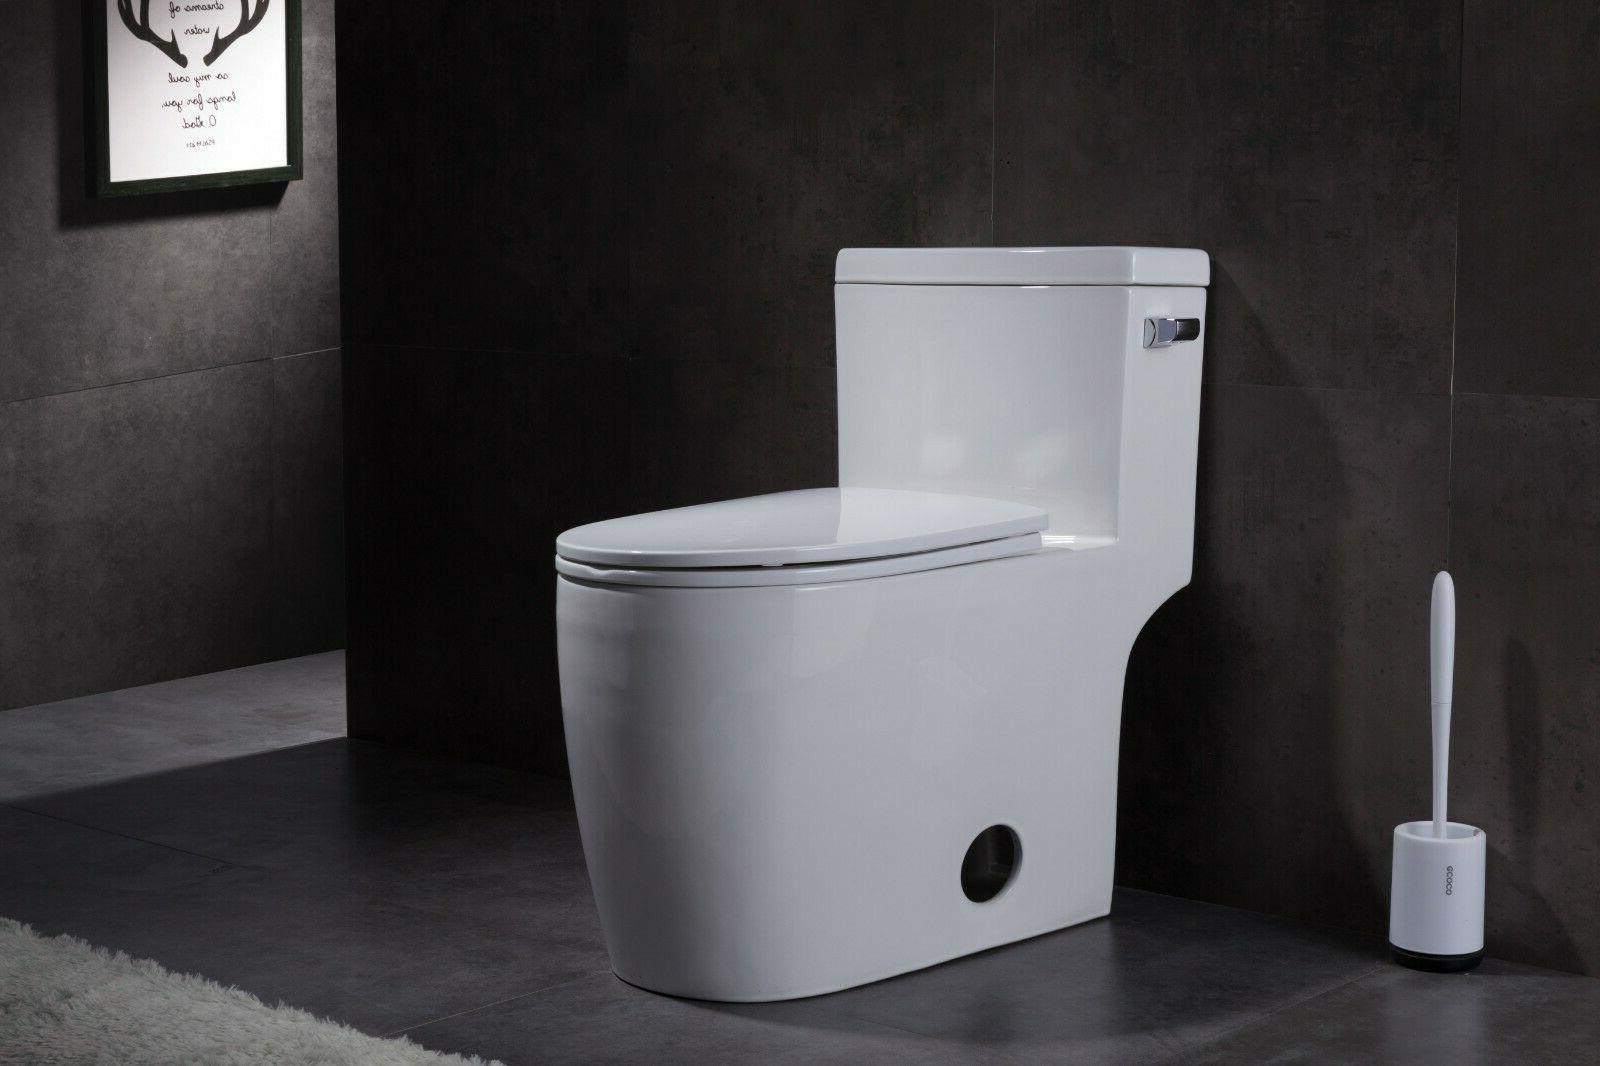 Marino 43295 Elongated One Piece Toilet w/ Quiet Close Seat,